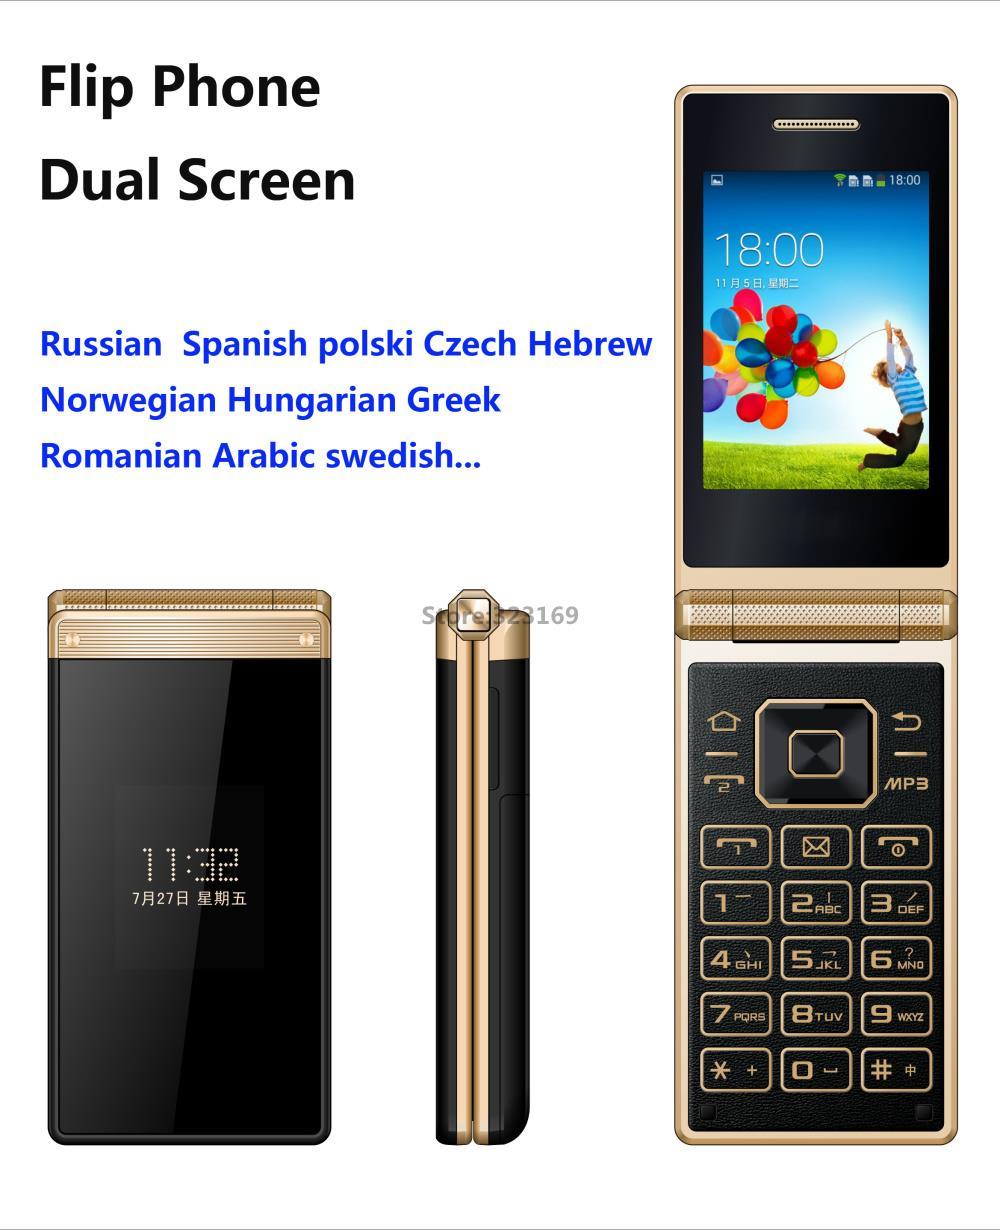 unlocked original big Key Senior mobile phone GSM old man cell phone clamshell phone flip phone dual sim Big Russian keyboard